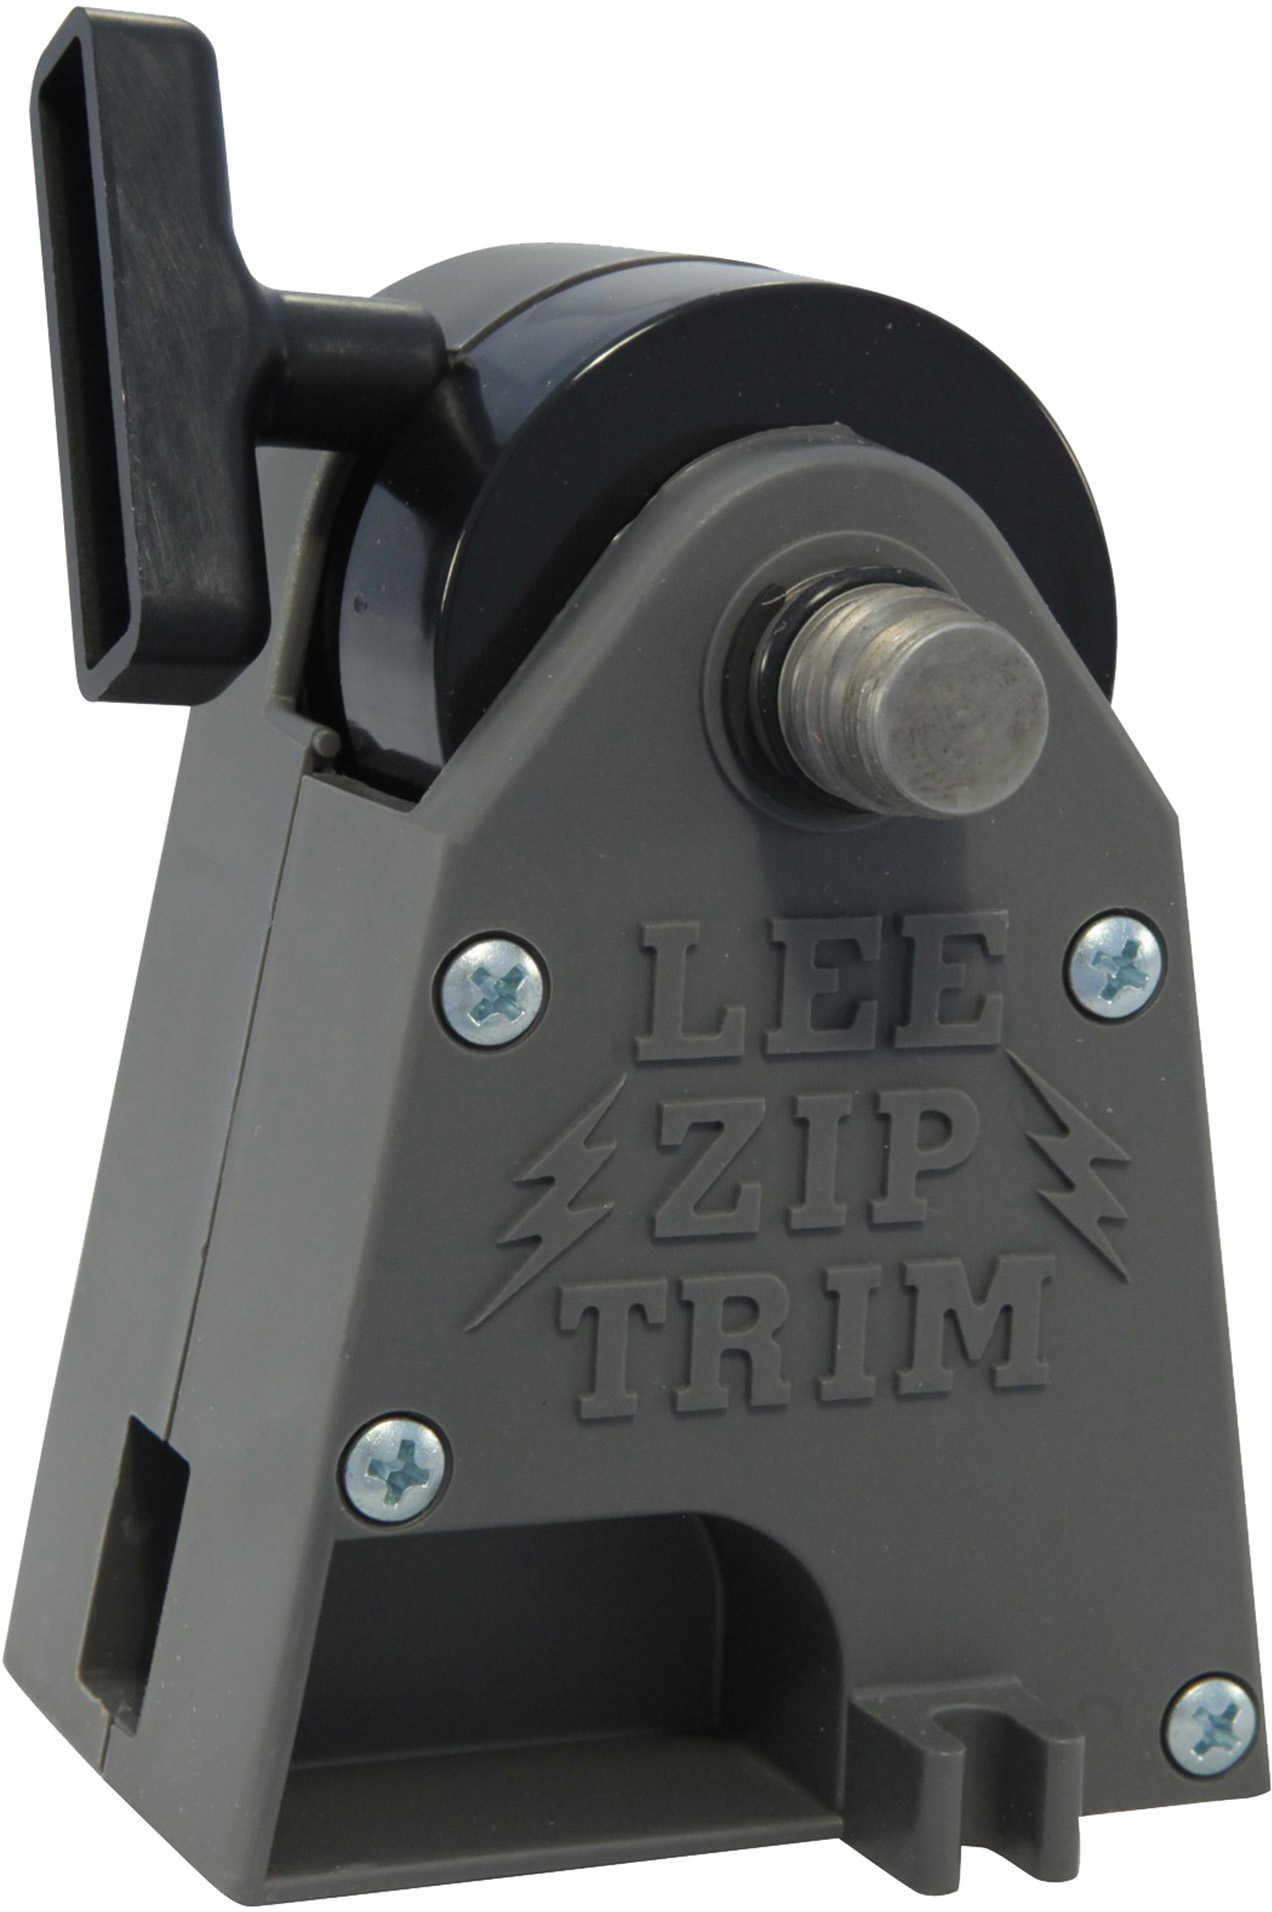 Lee Reloading Zip Trim Power Head